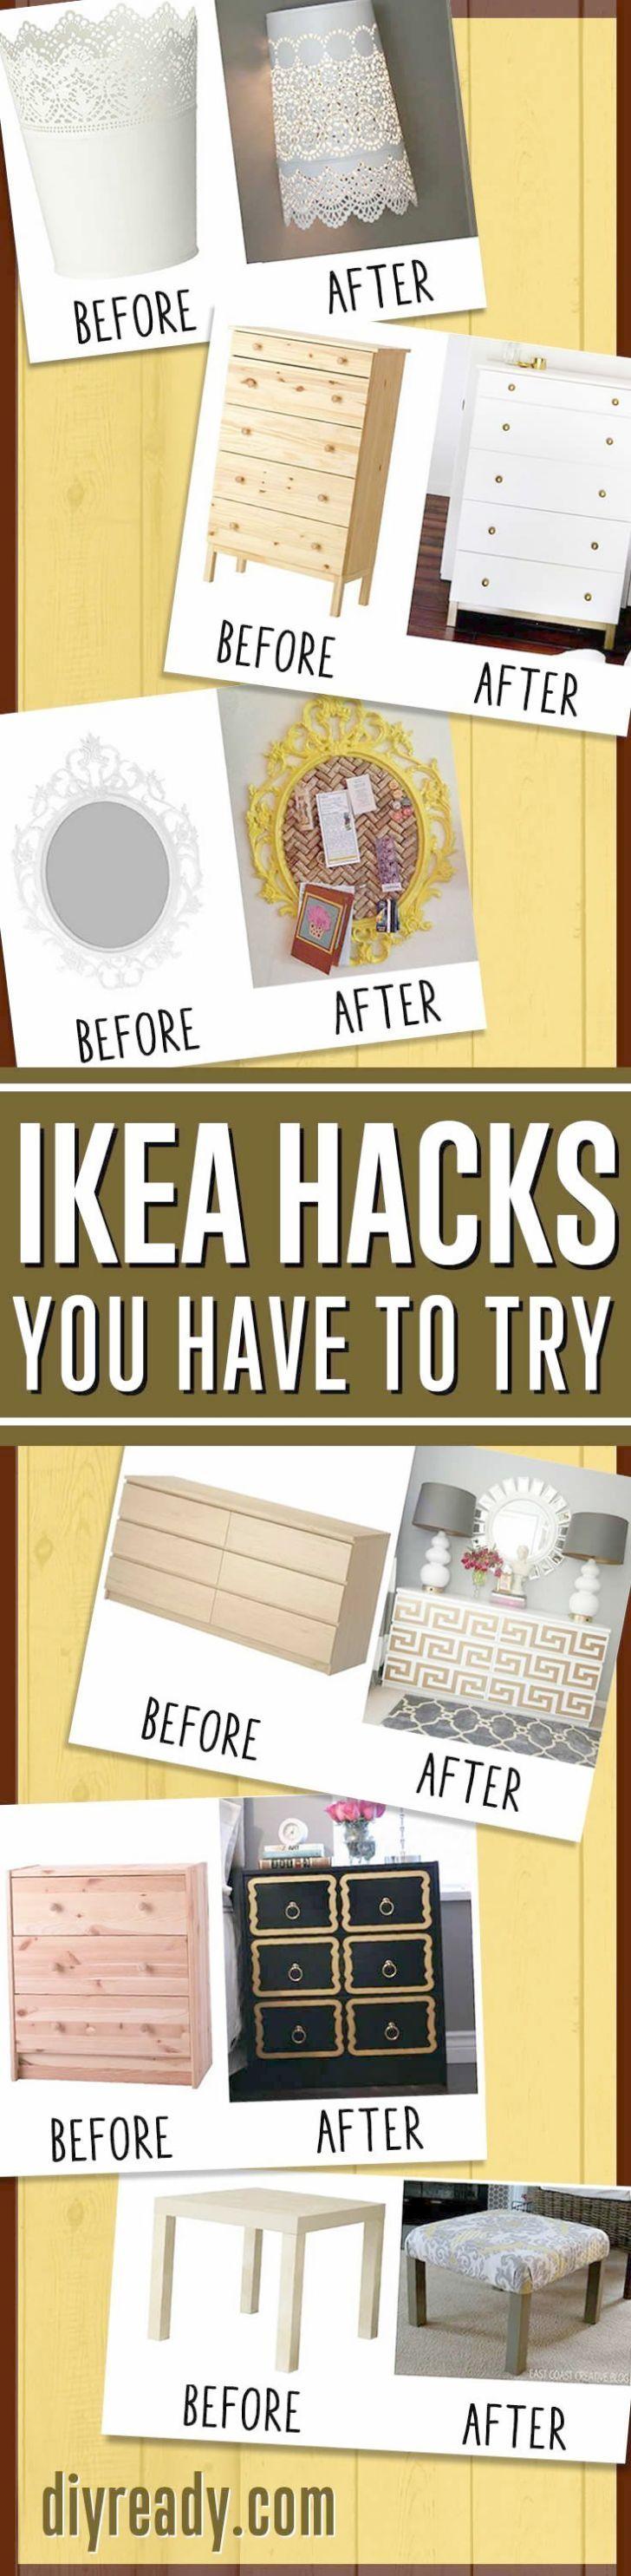 Diy Home Decor Ideas  Ikea Hacks Awesome Home Decor